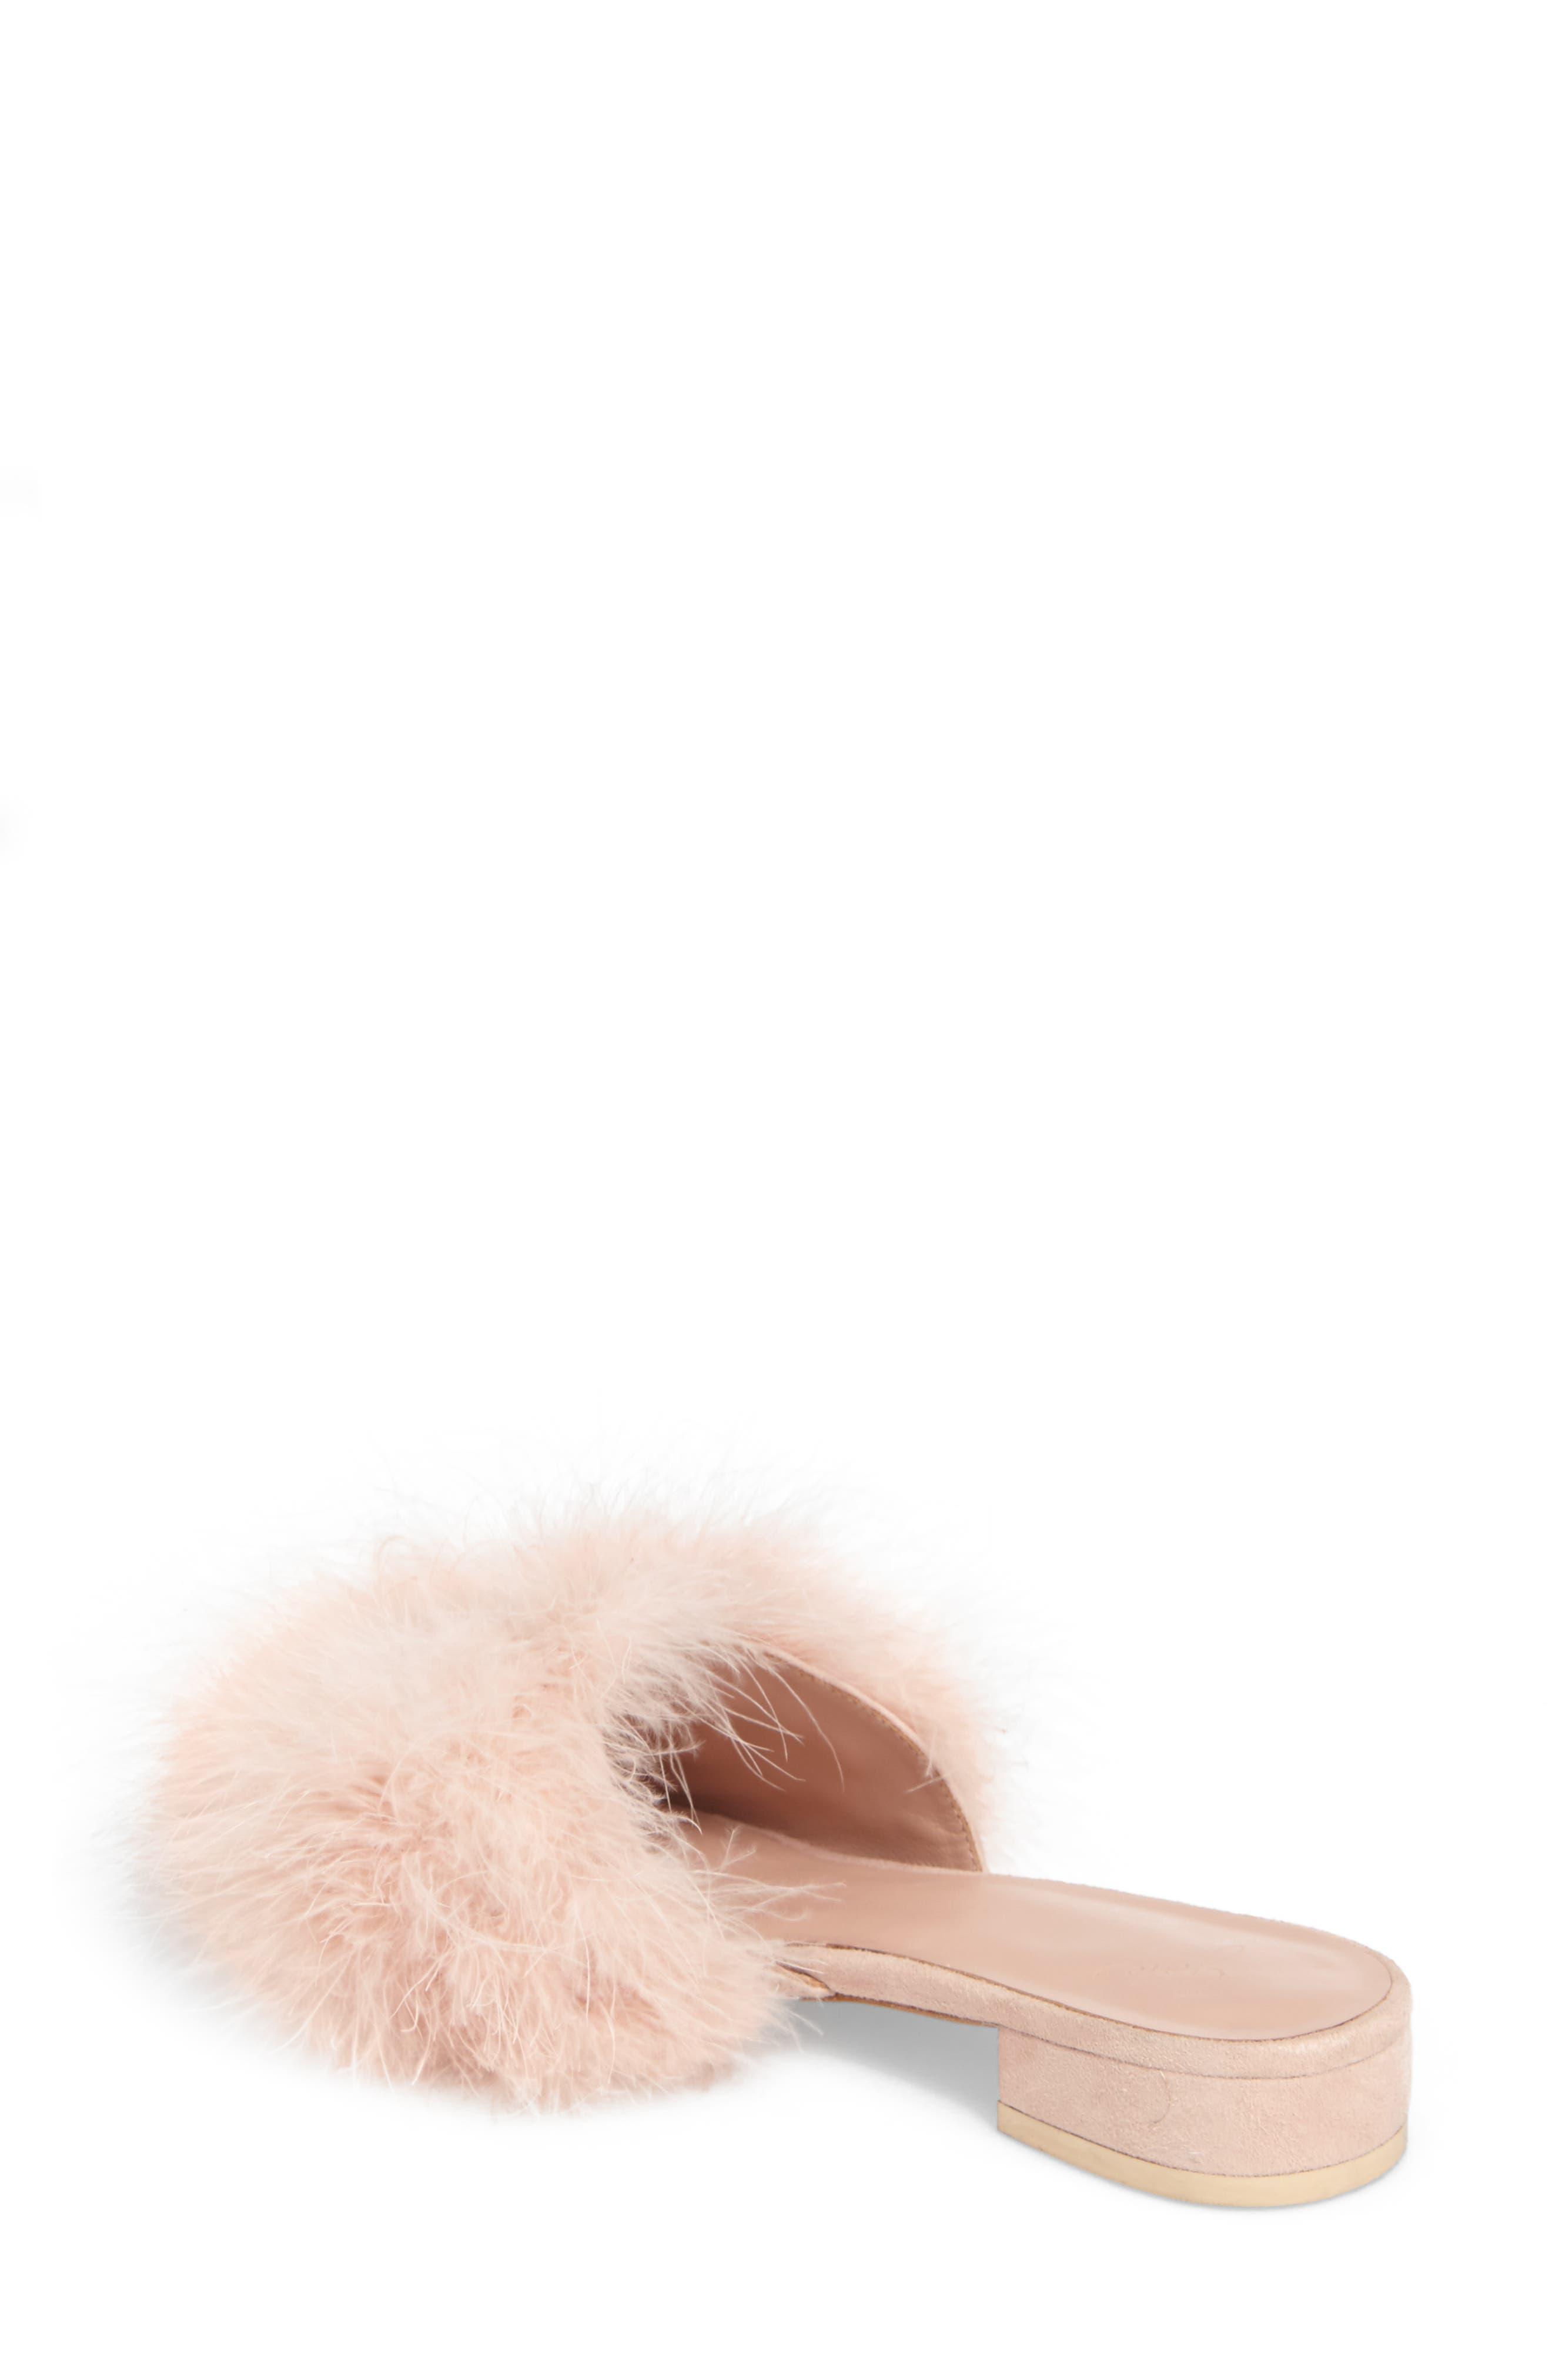 Mani Feather Slide Sandal,                             Alternate thumbnail 2, color,                             Ballet